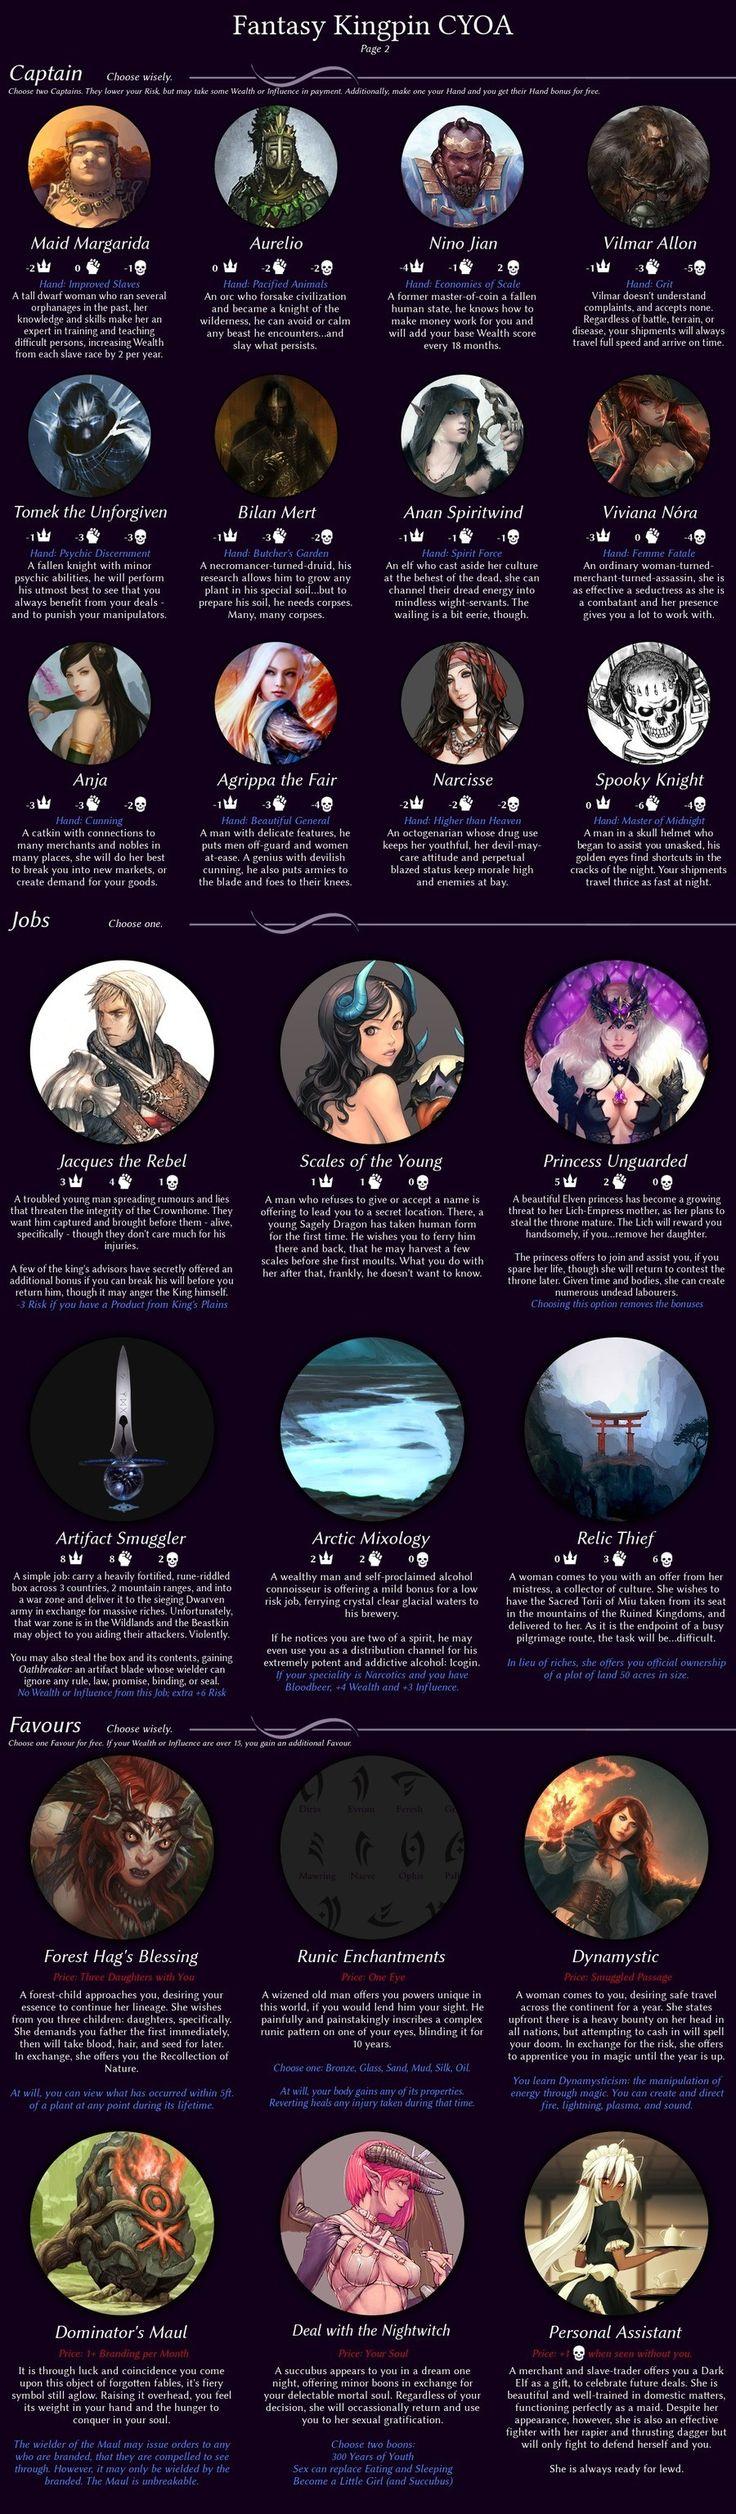 Fantasy Kingdom CYOA